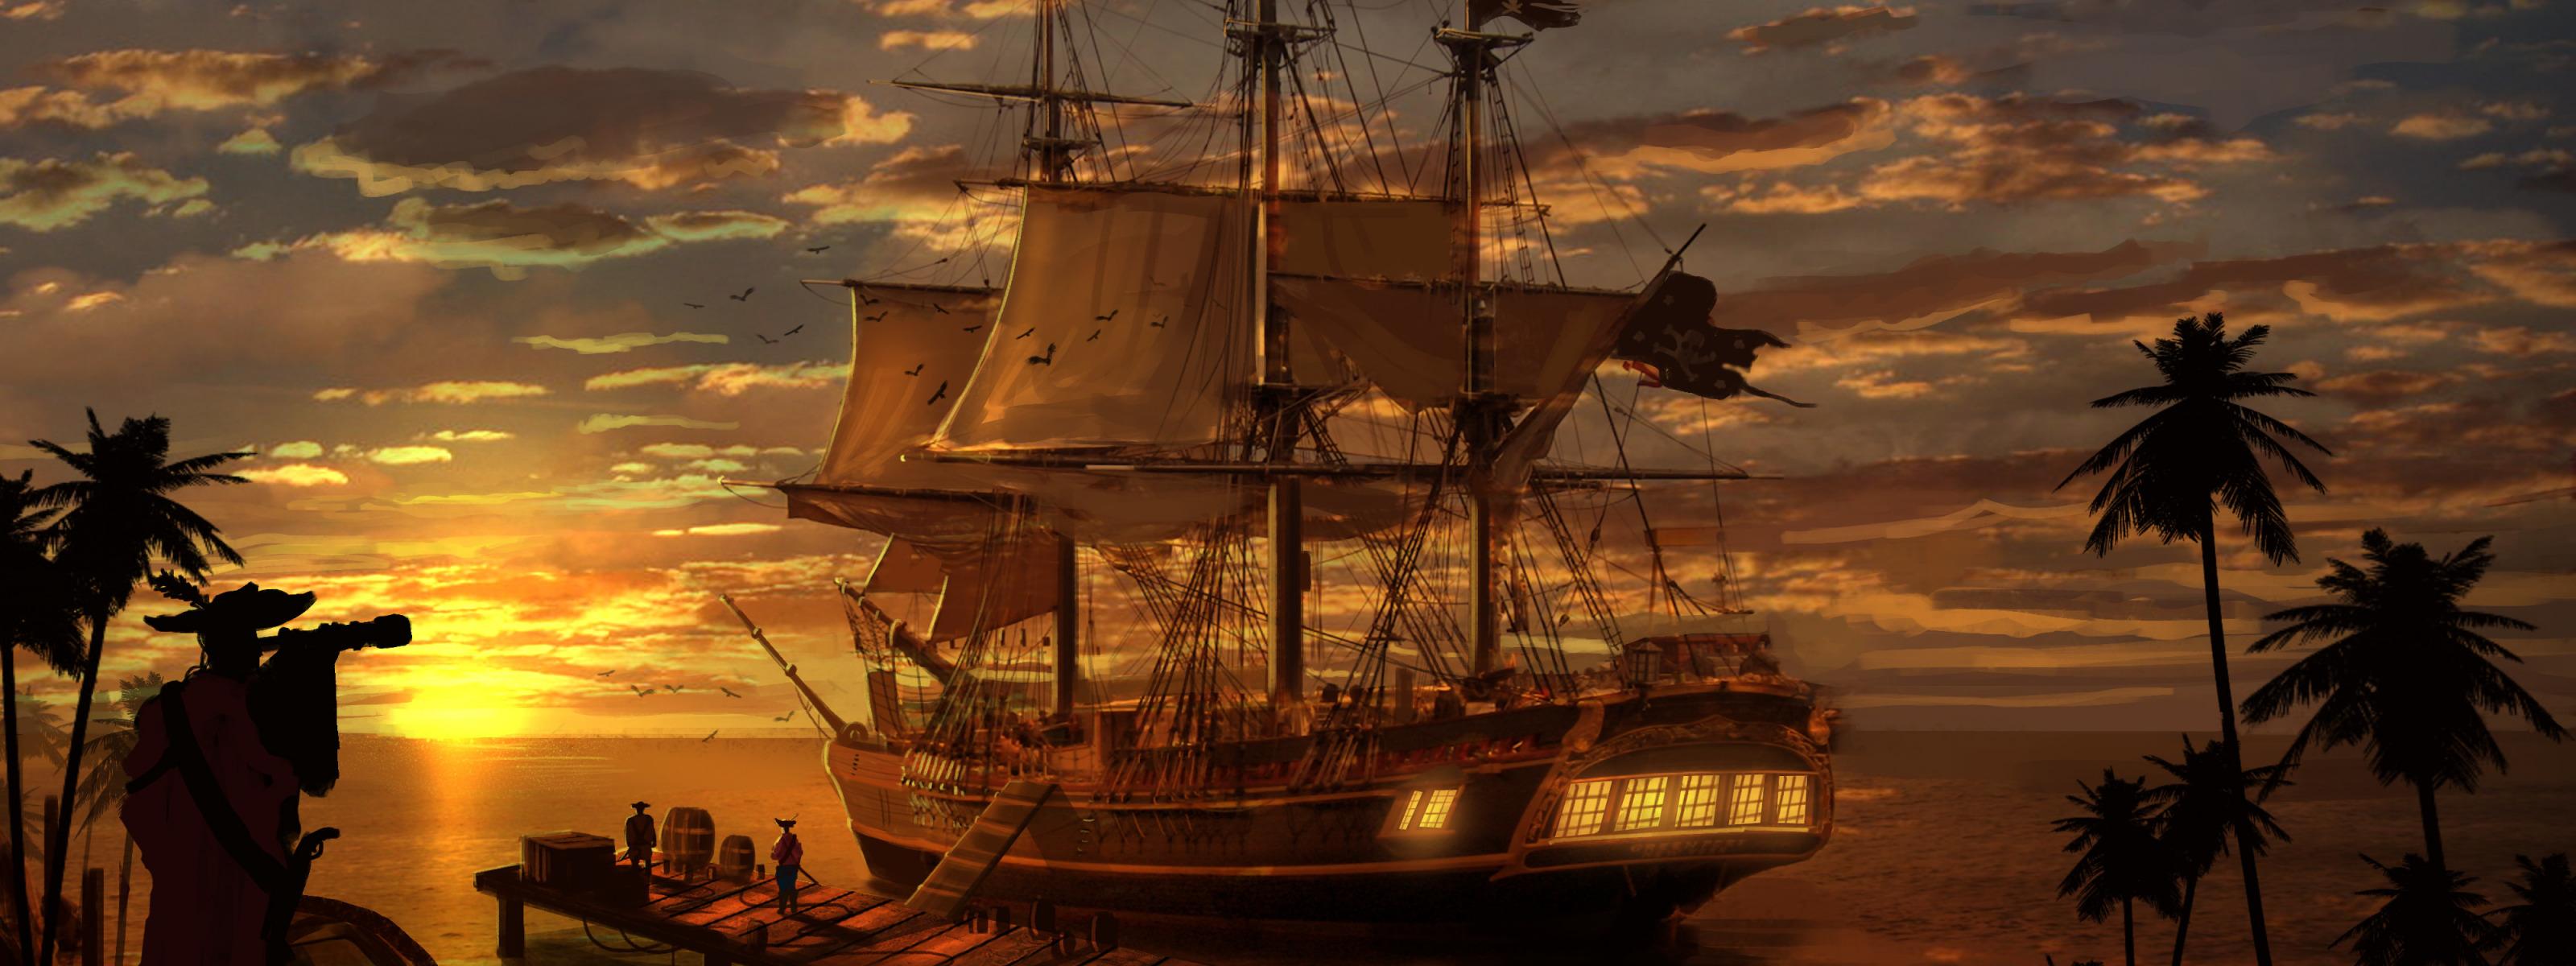 фрегат пираты карибов картинки уверяли